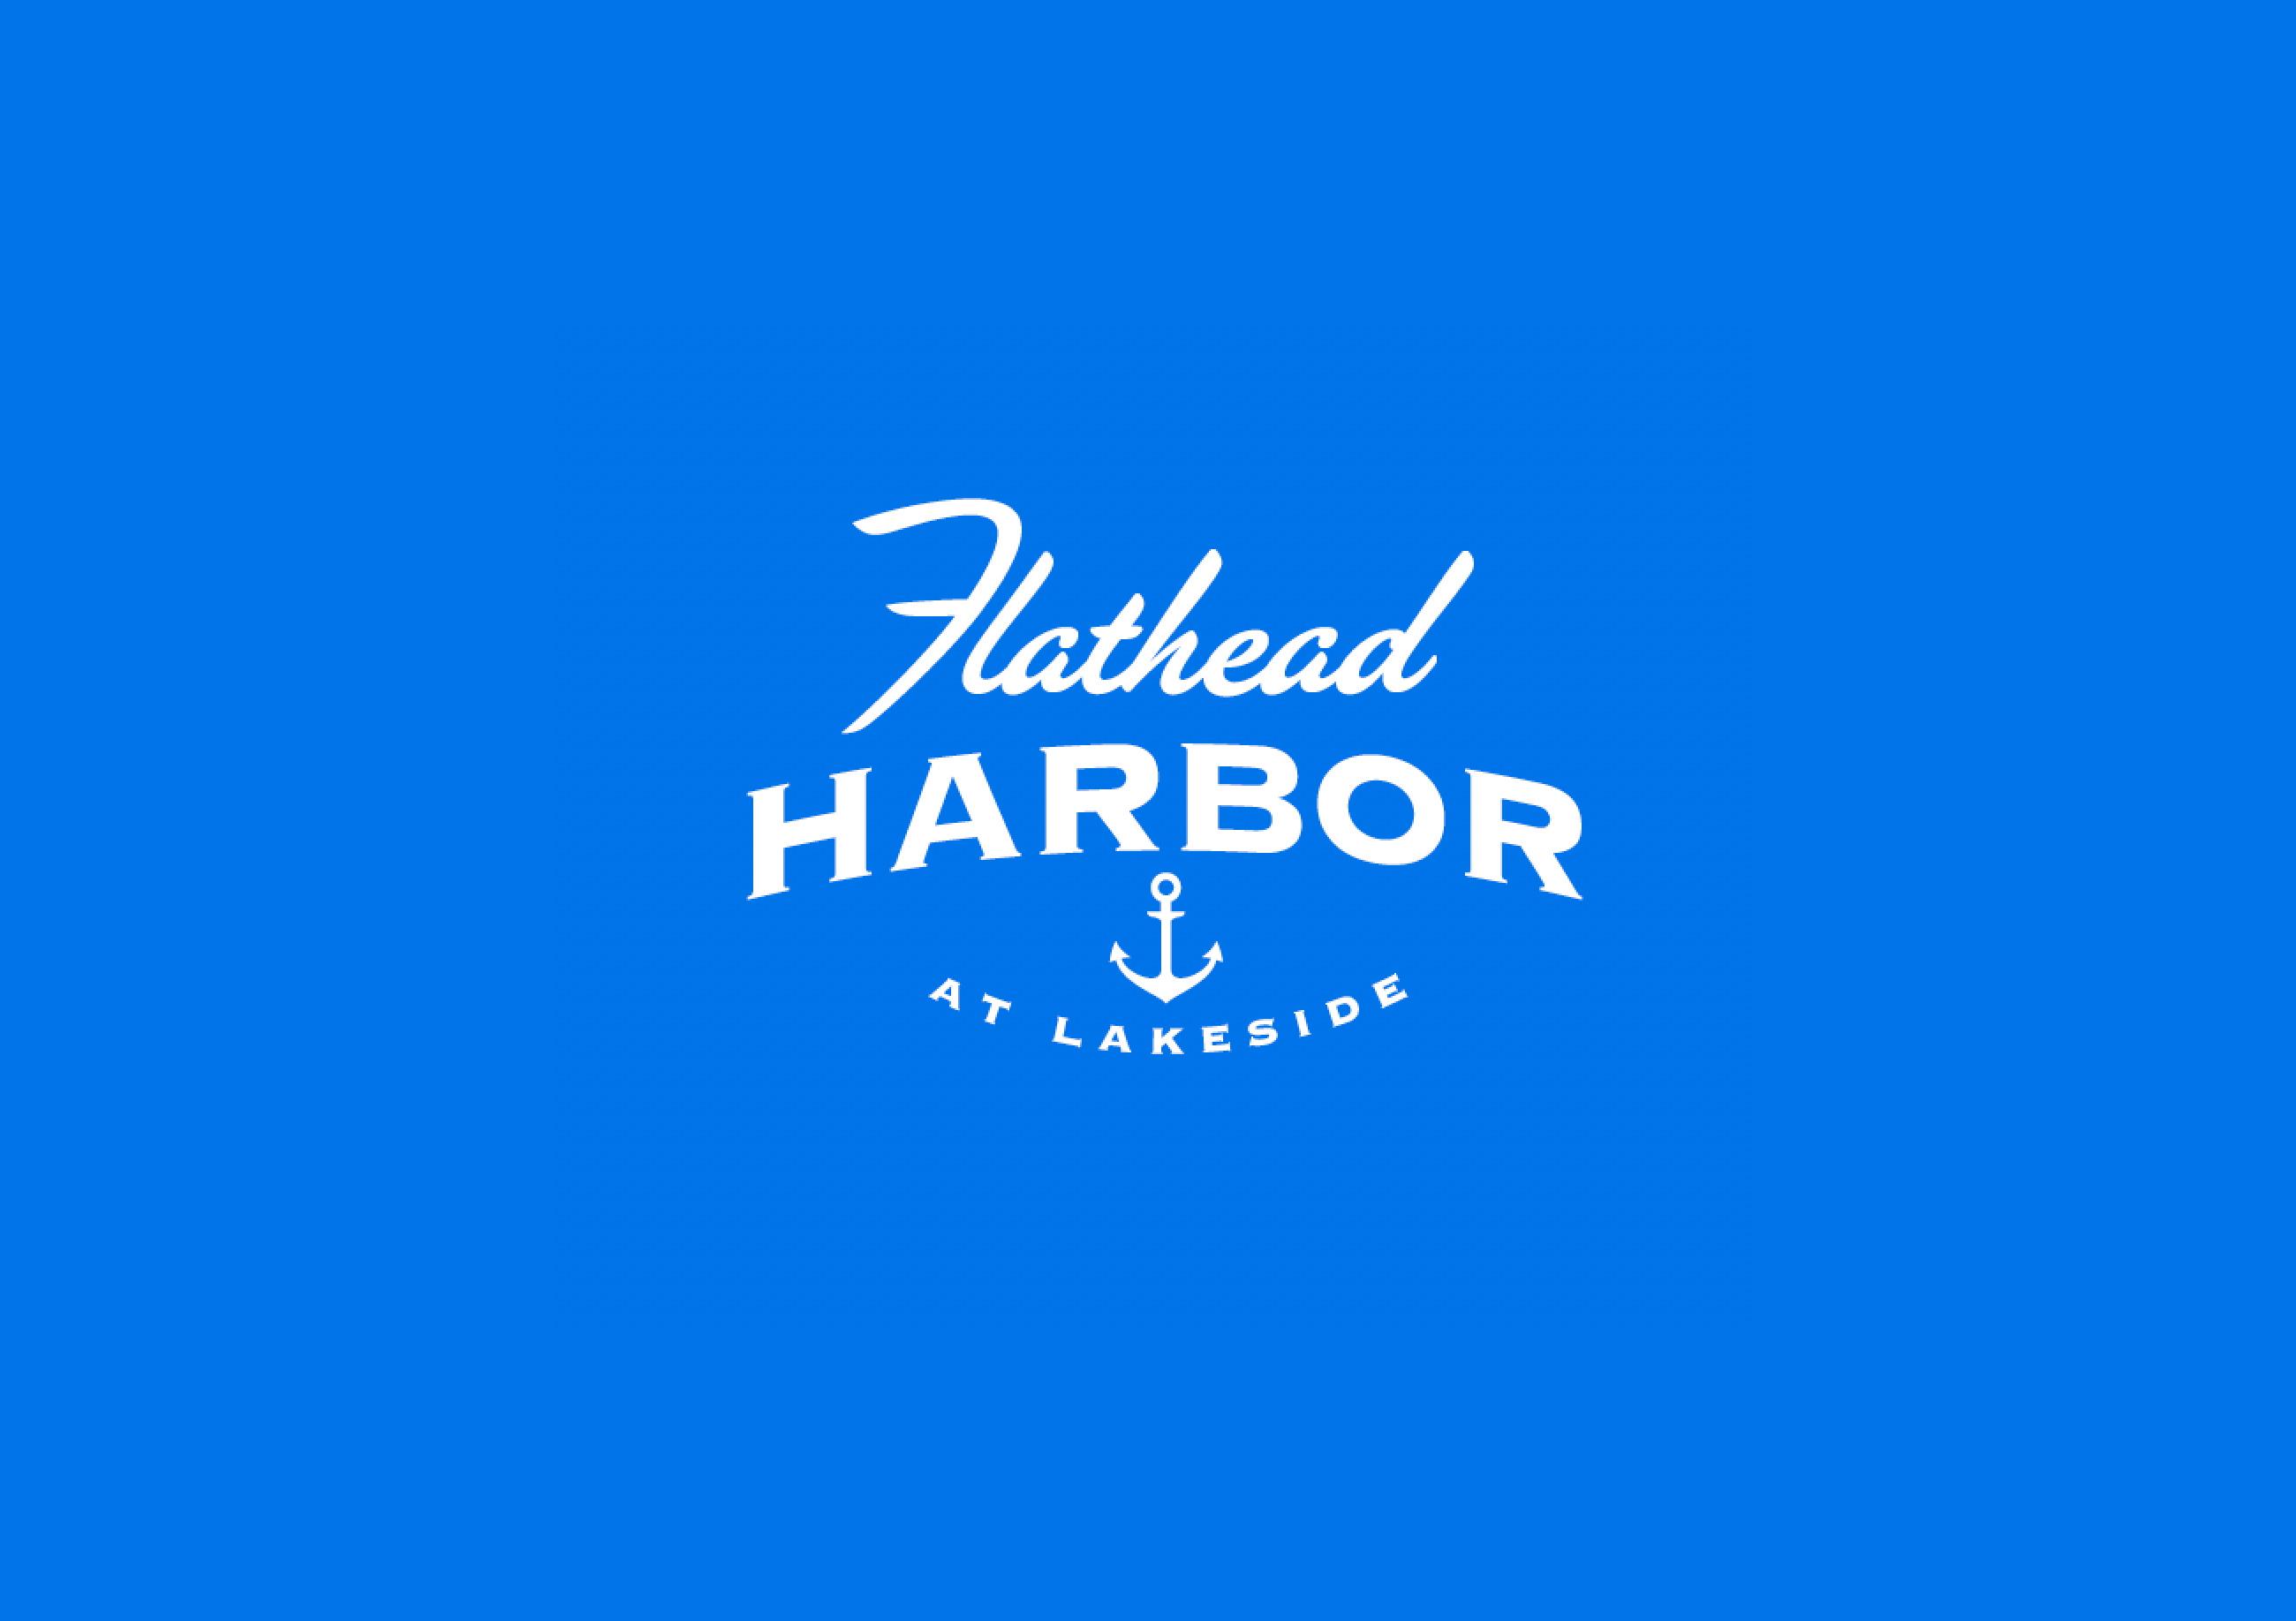 Flathead-Harbor-logo-on-blue-2600x1836px